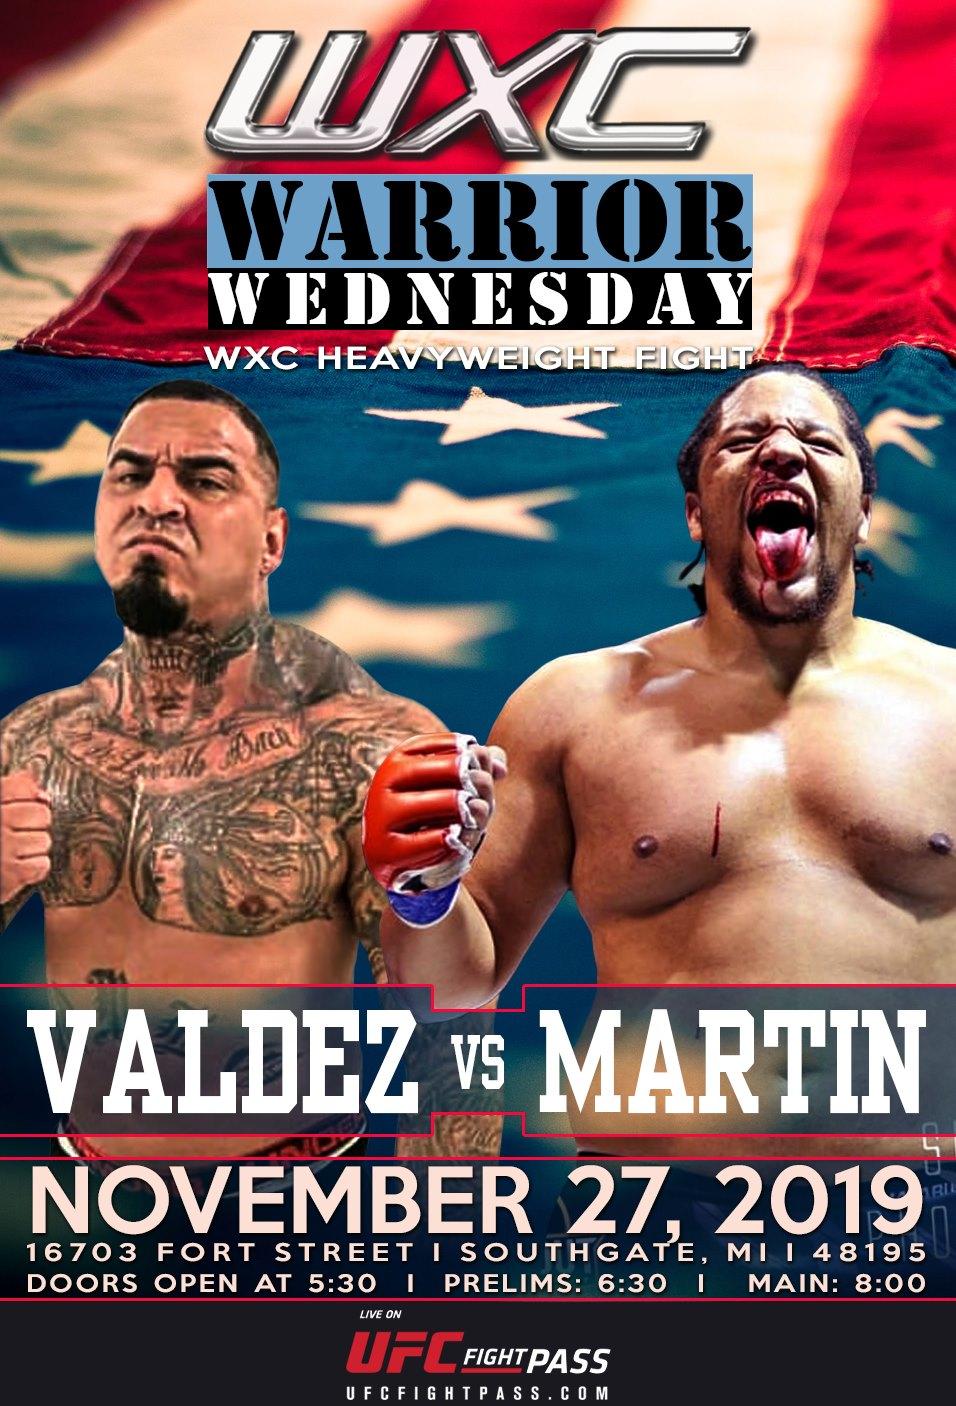 Thanksgiving Eve - Warrior Wednesday IX pairs Abel Valdez against Jonathan Martin